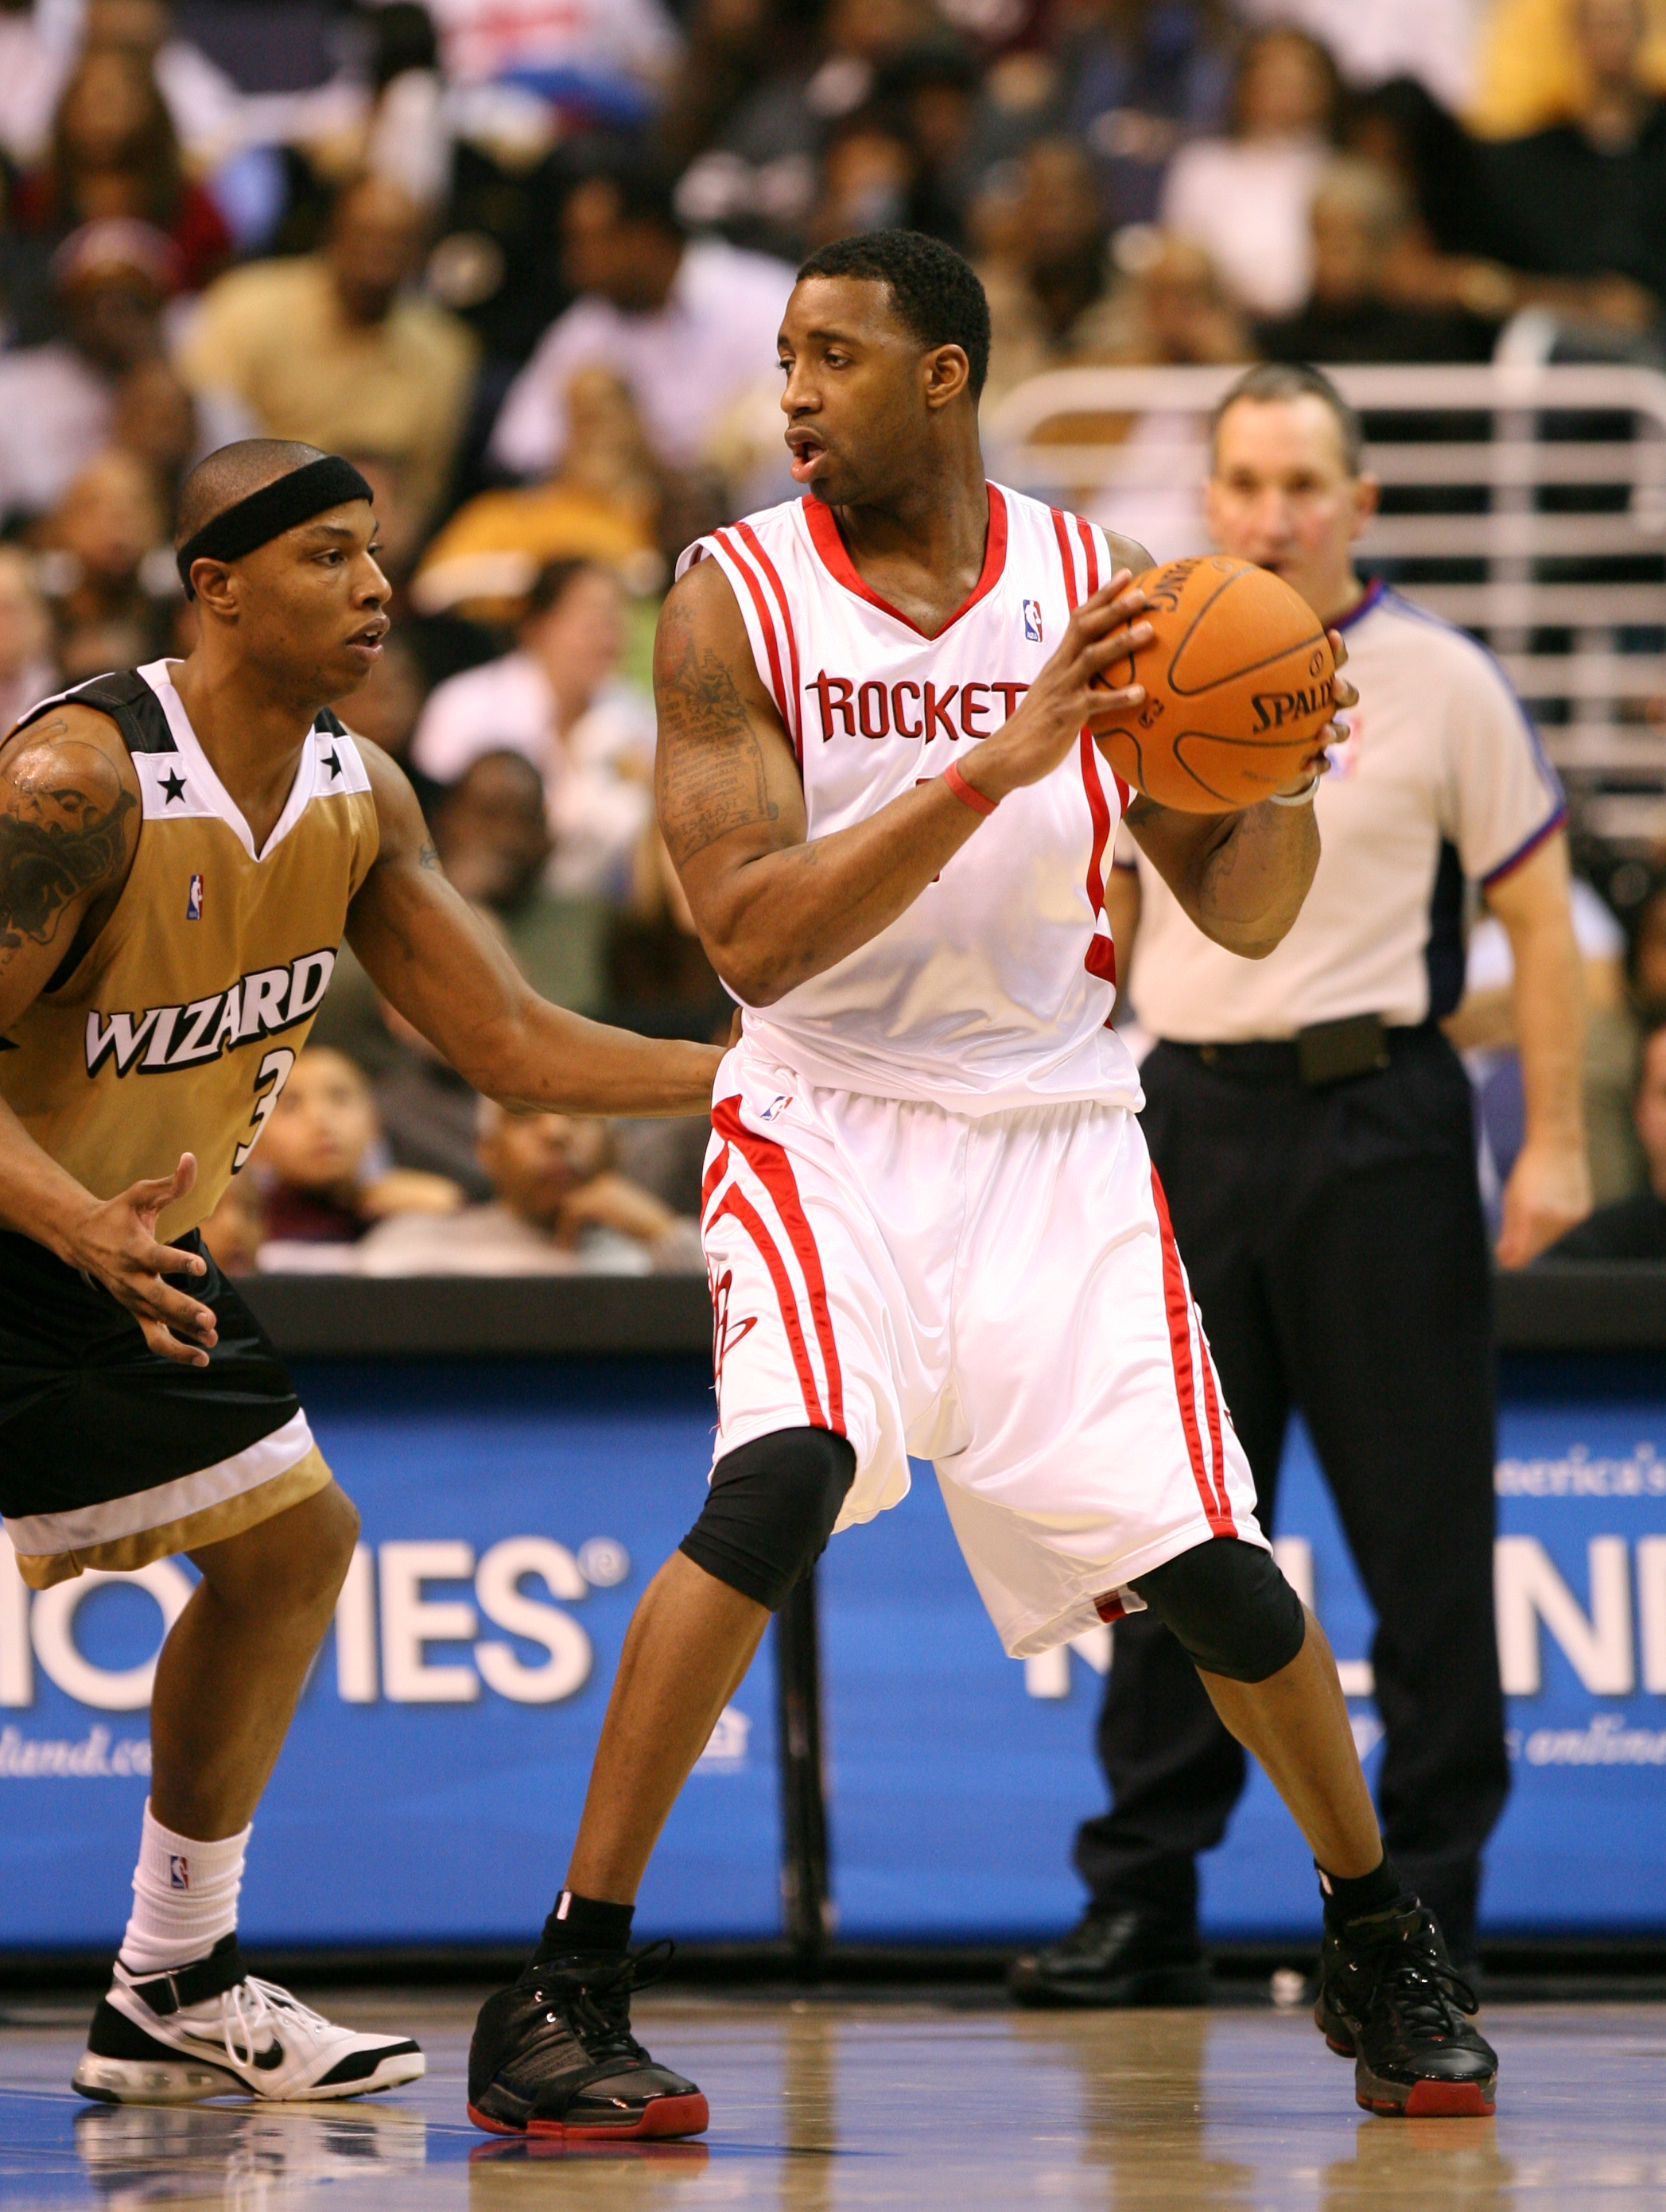 Basketball Players: NBA Most Improved Player Award